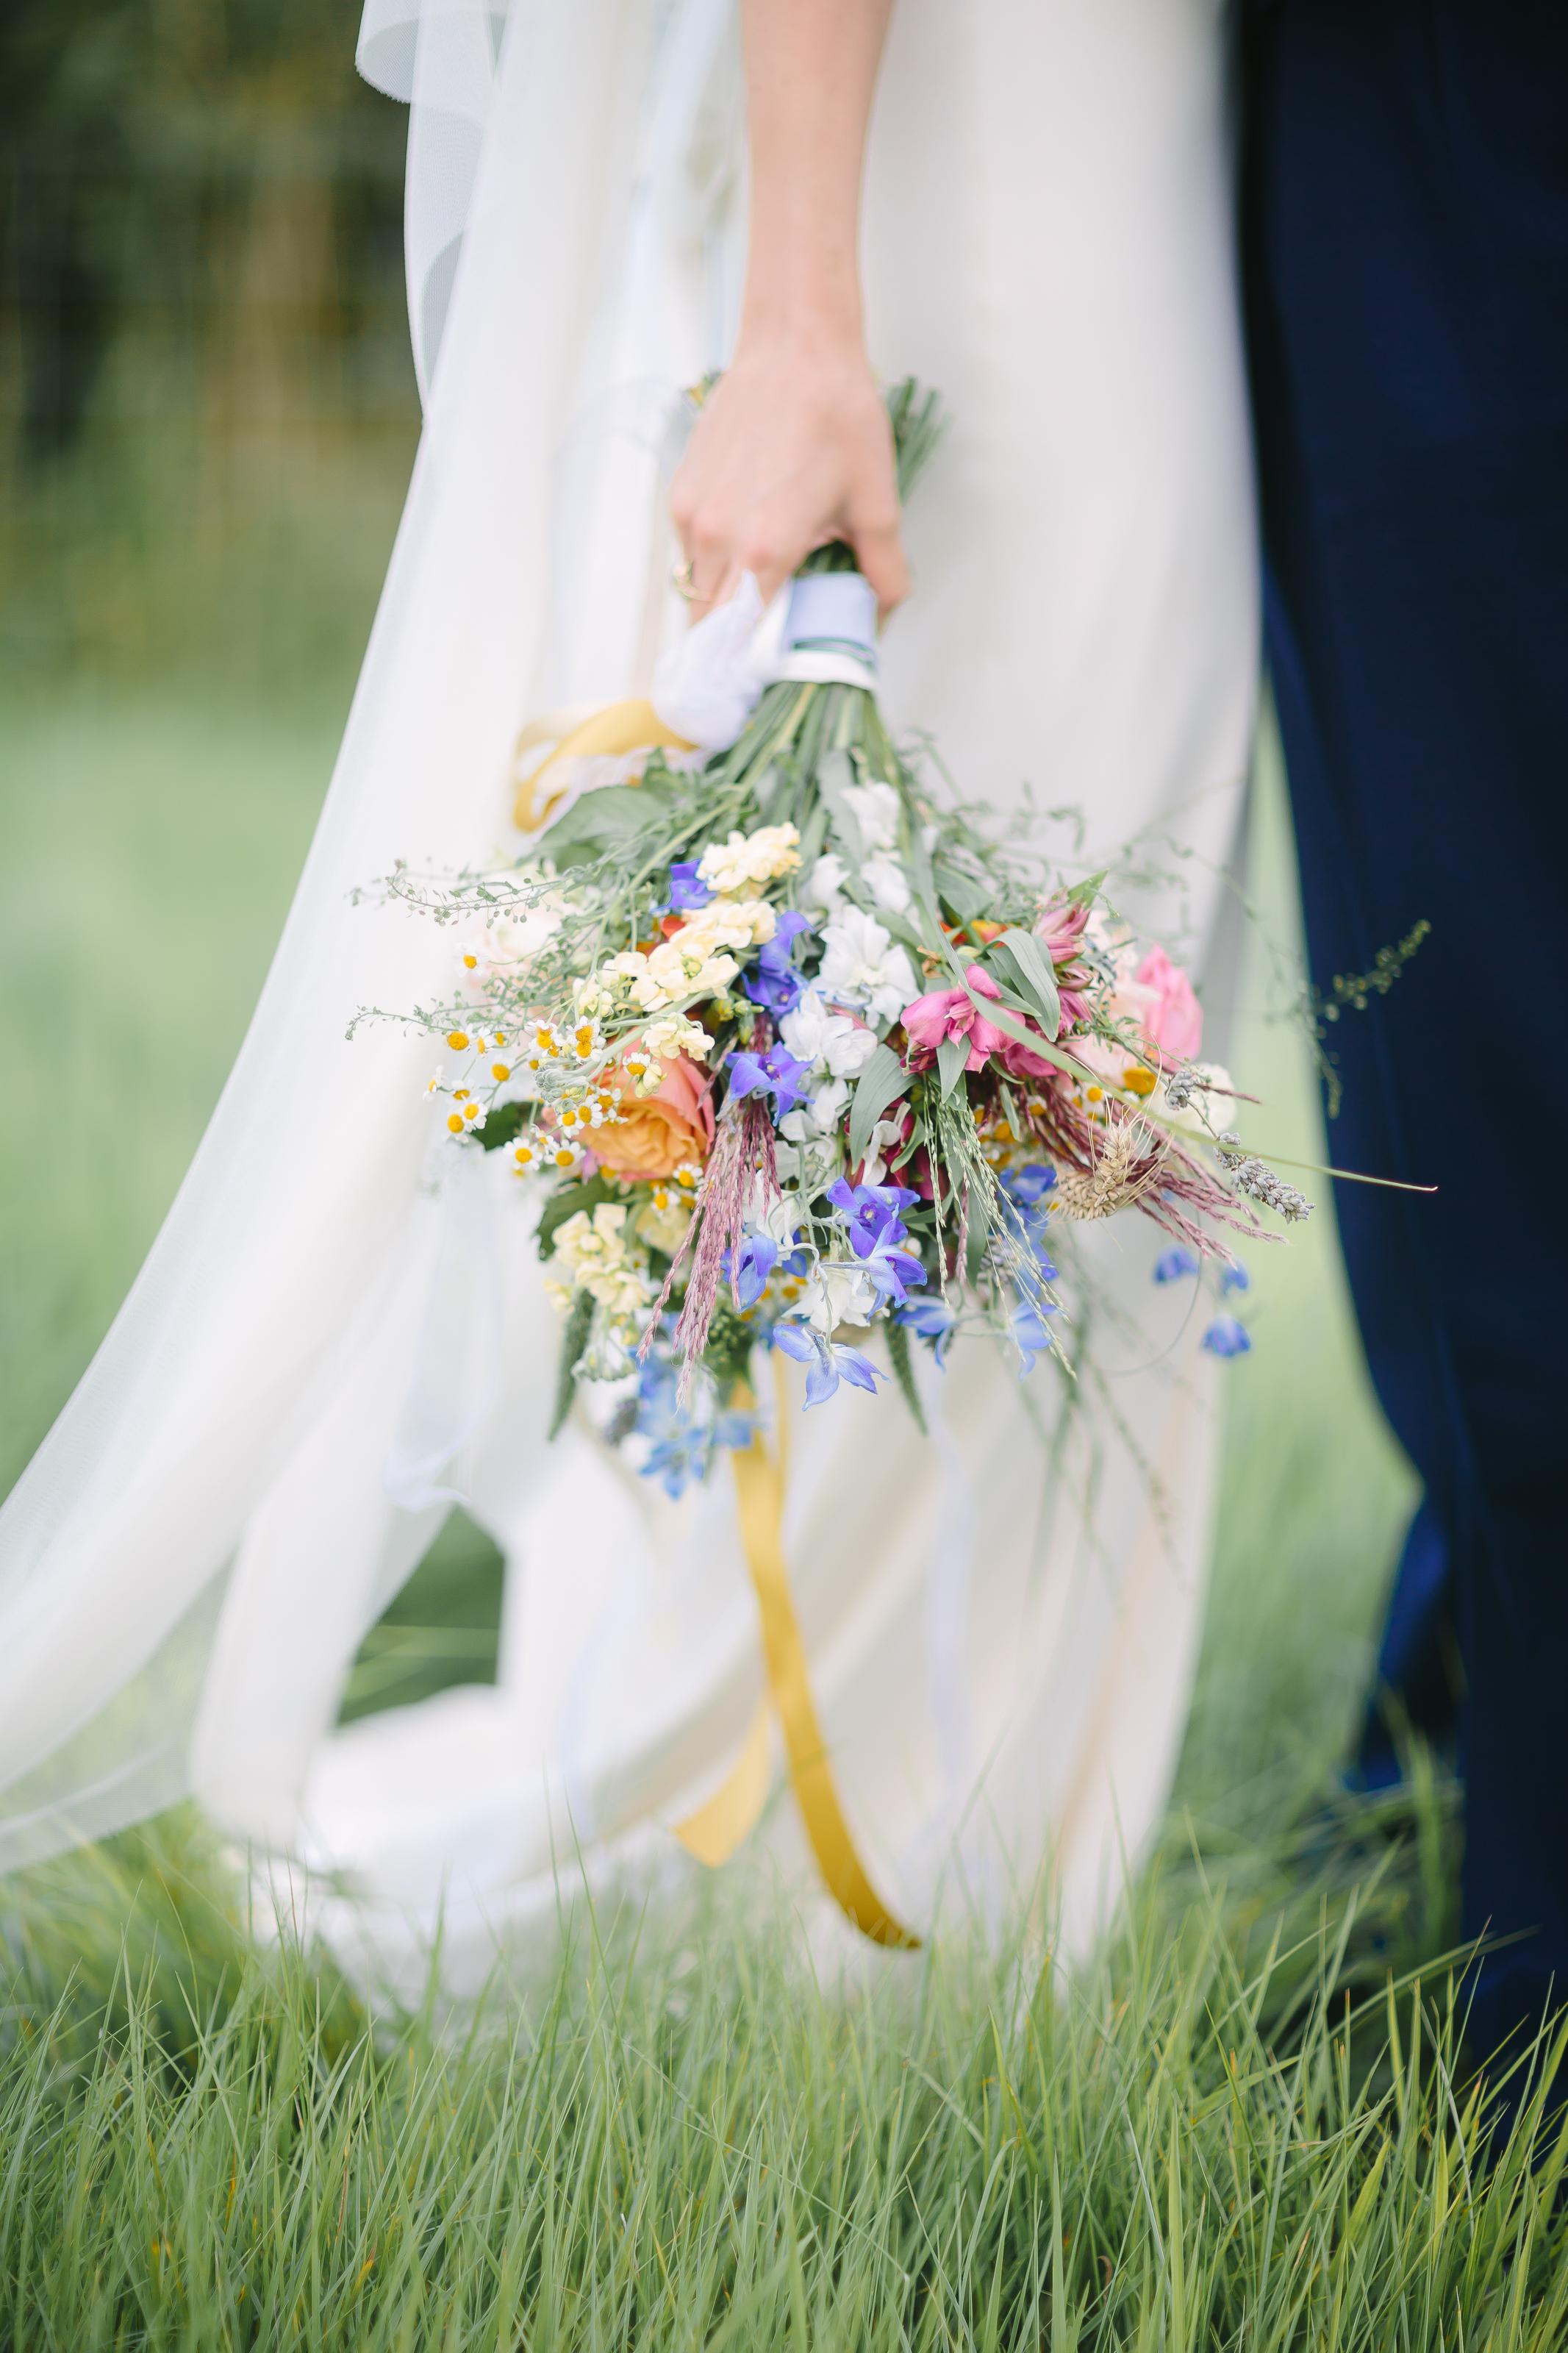 Wedding-Stockerston-Weddingphotographer-82.jpg